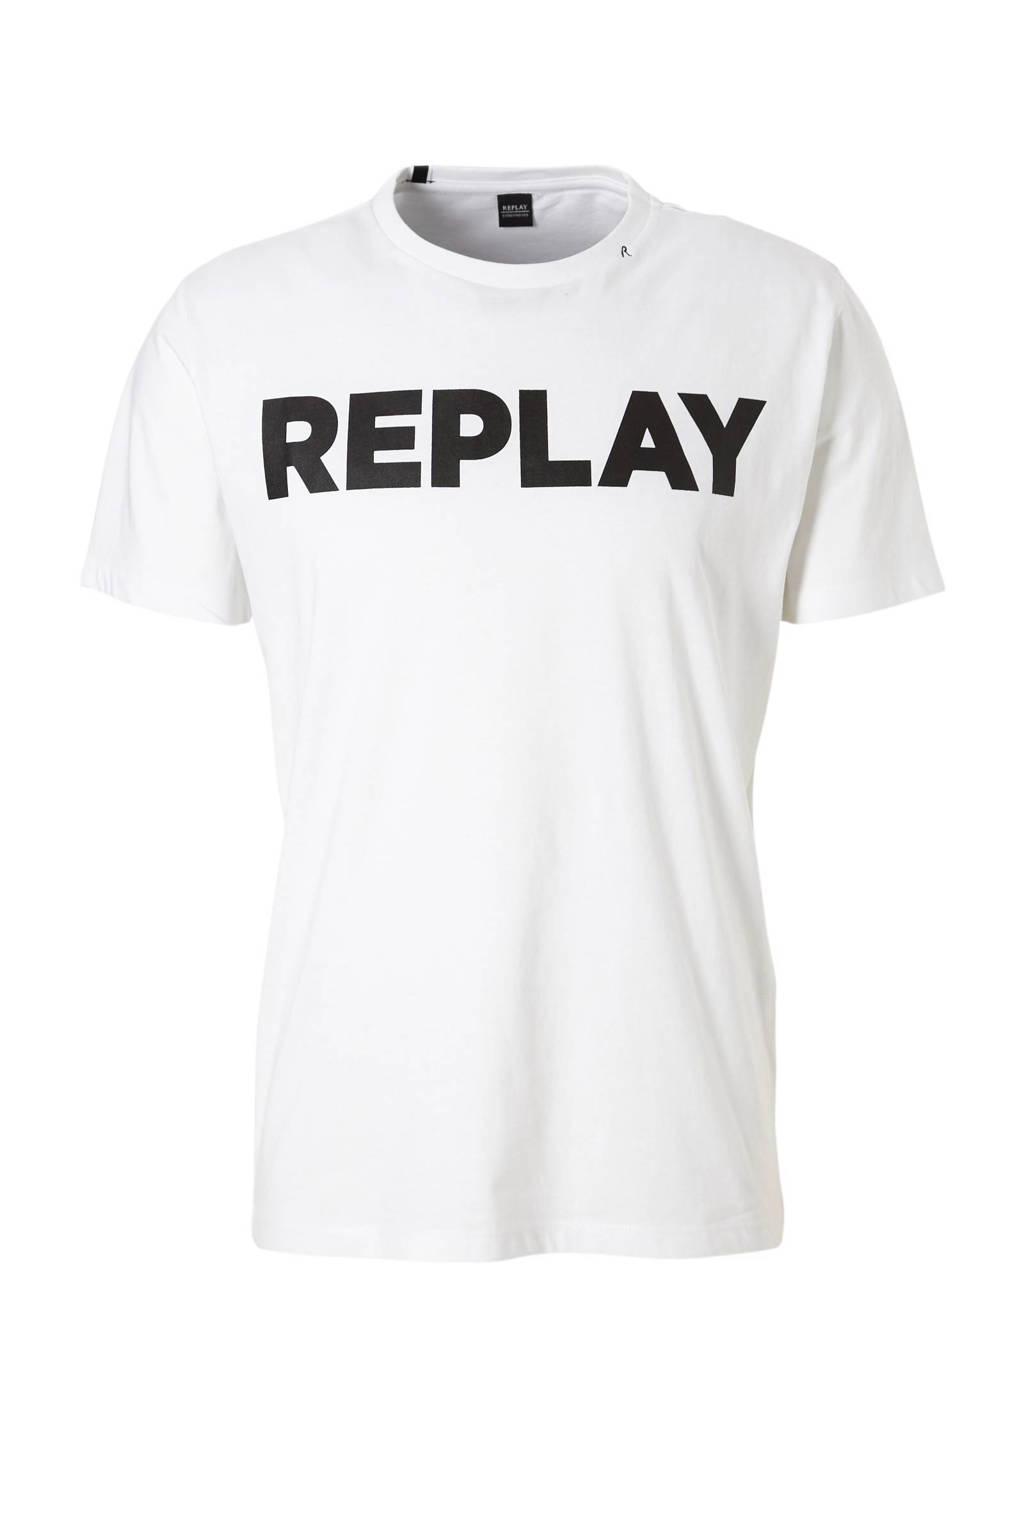 REPLAY T-shirt, Wit/zwart